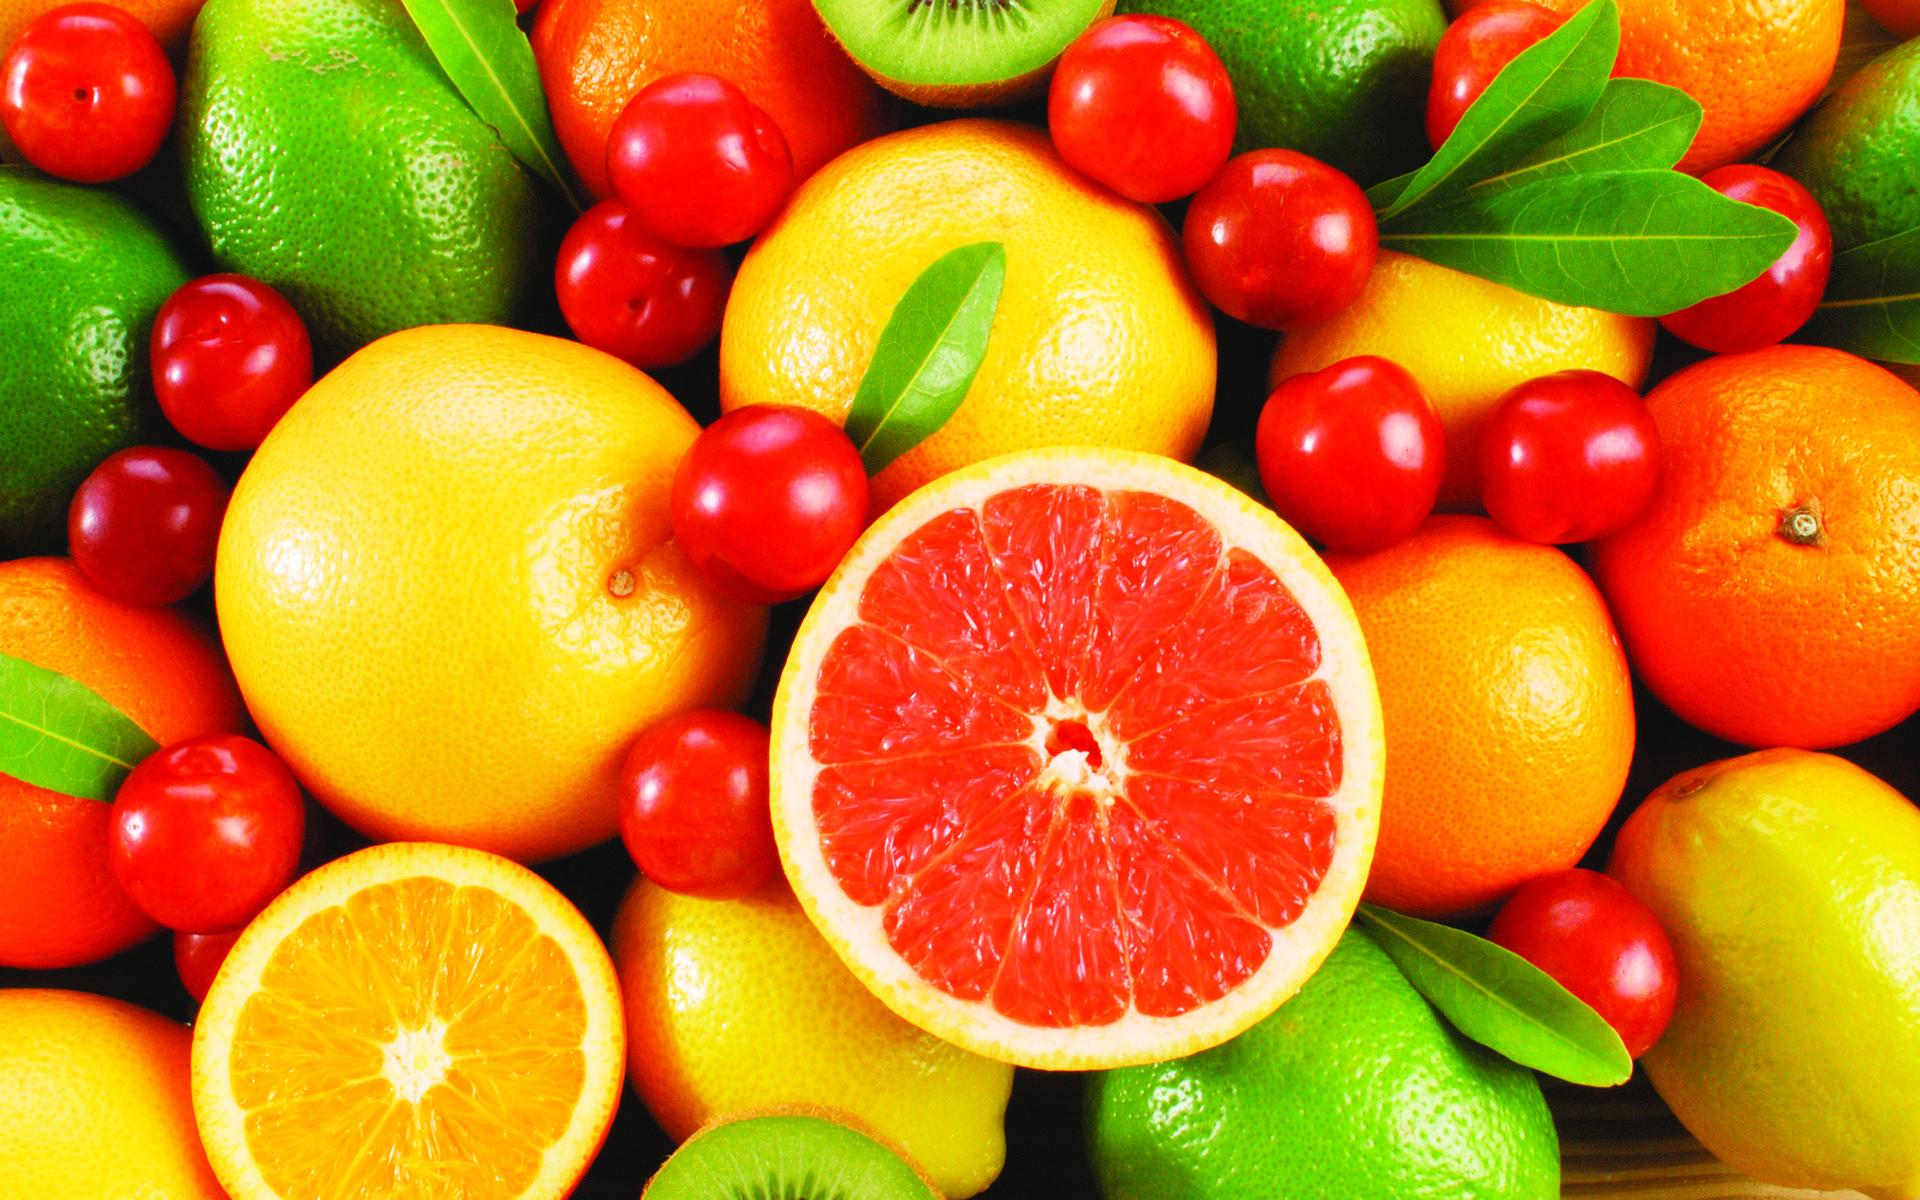 Or orange fruit hd wallpaper - 339 Fruit Wallpapers Fruit Backgrounds Page 11